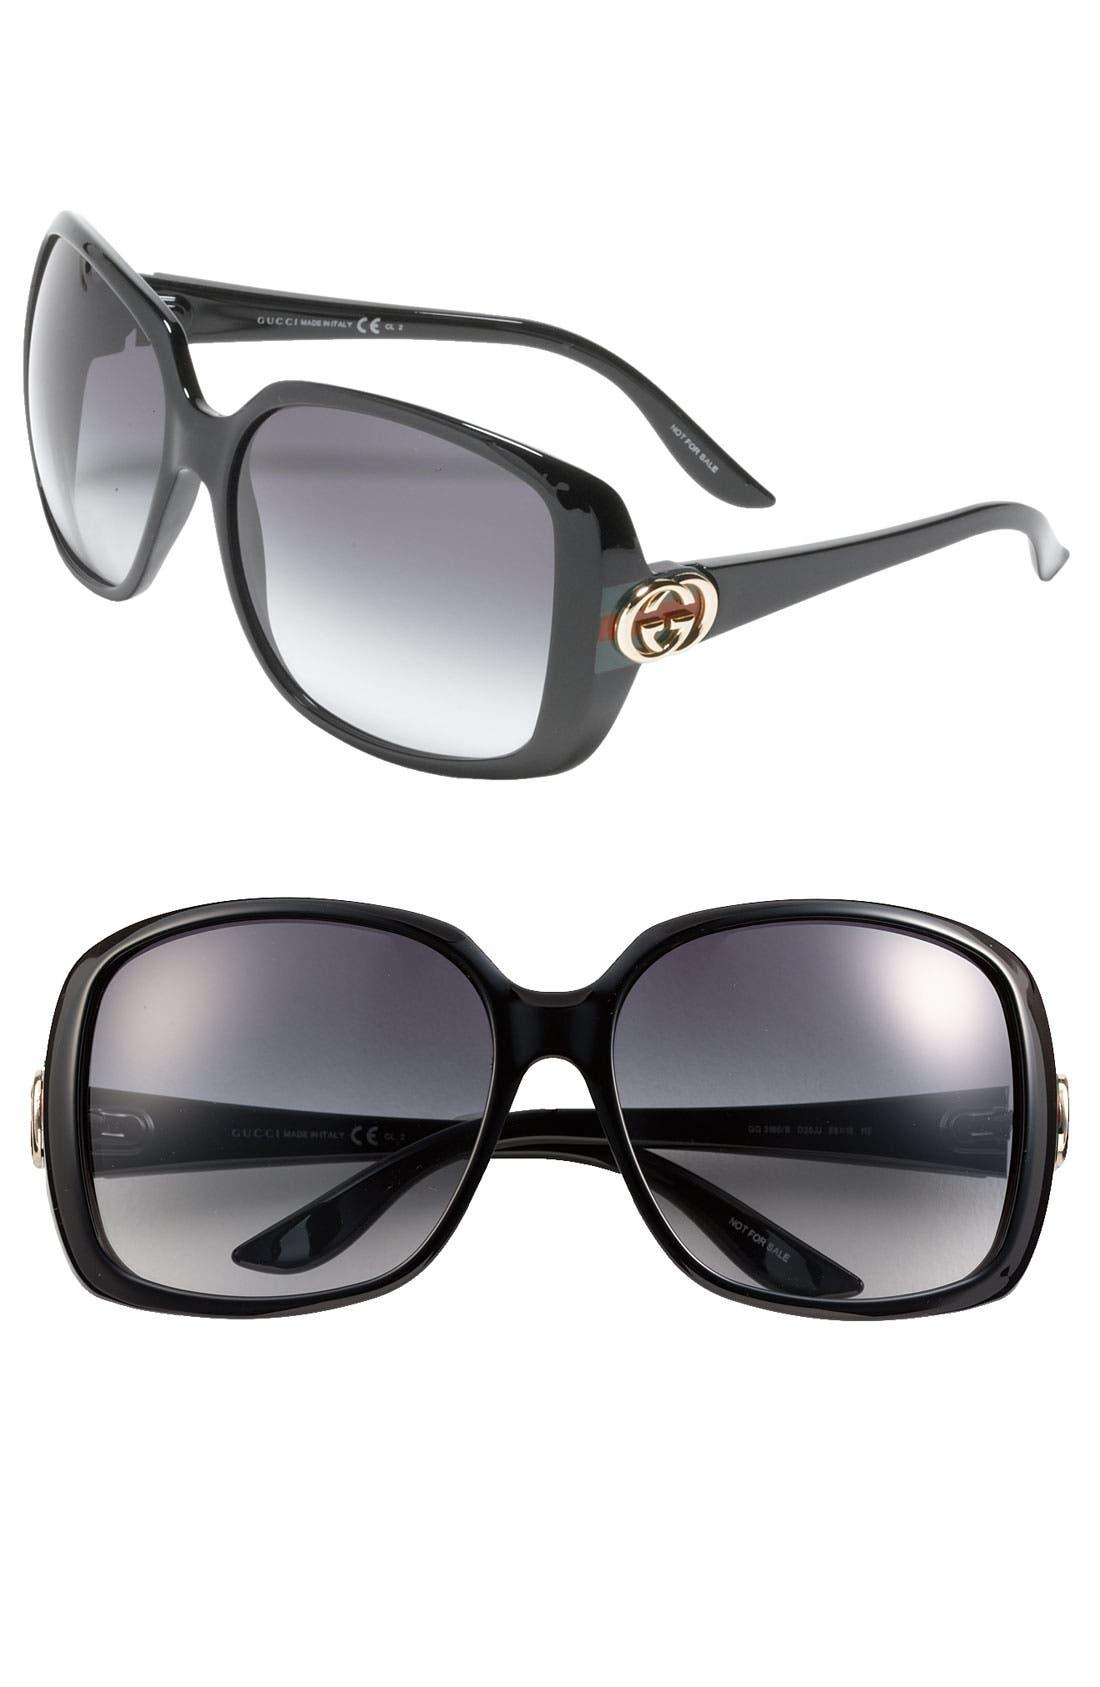 59mm Oversized Square Sunglasses,                             Main thumbnail 1, color,                             001